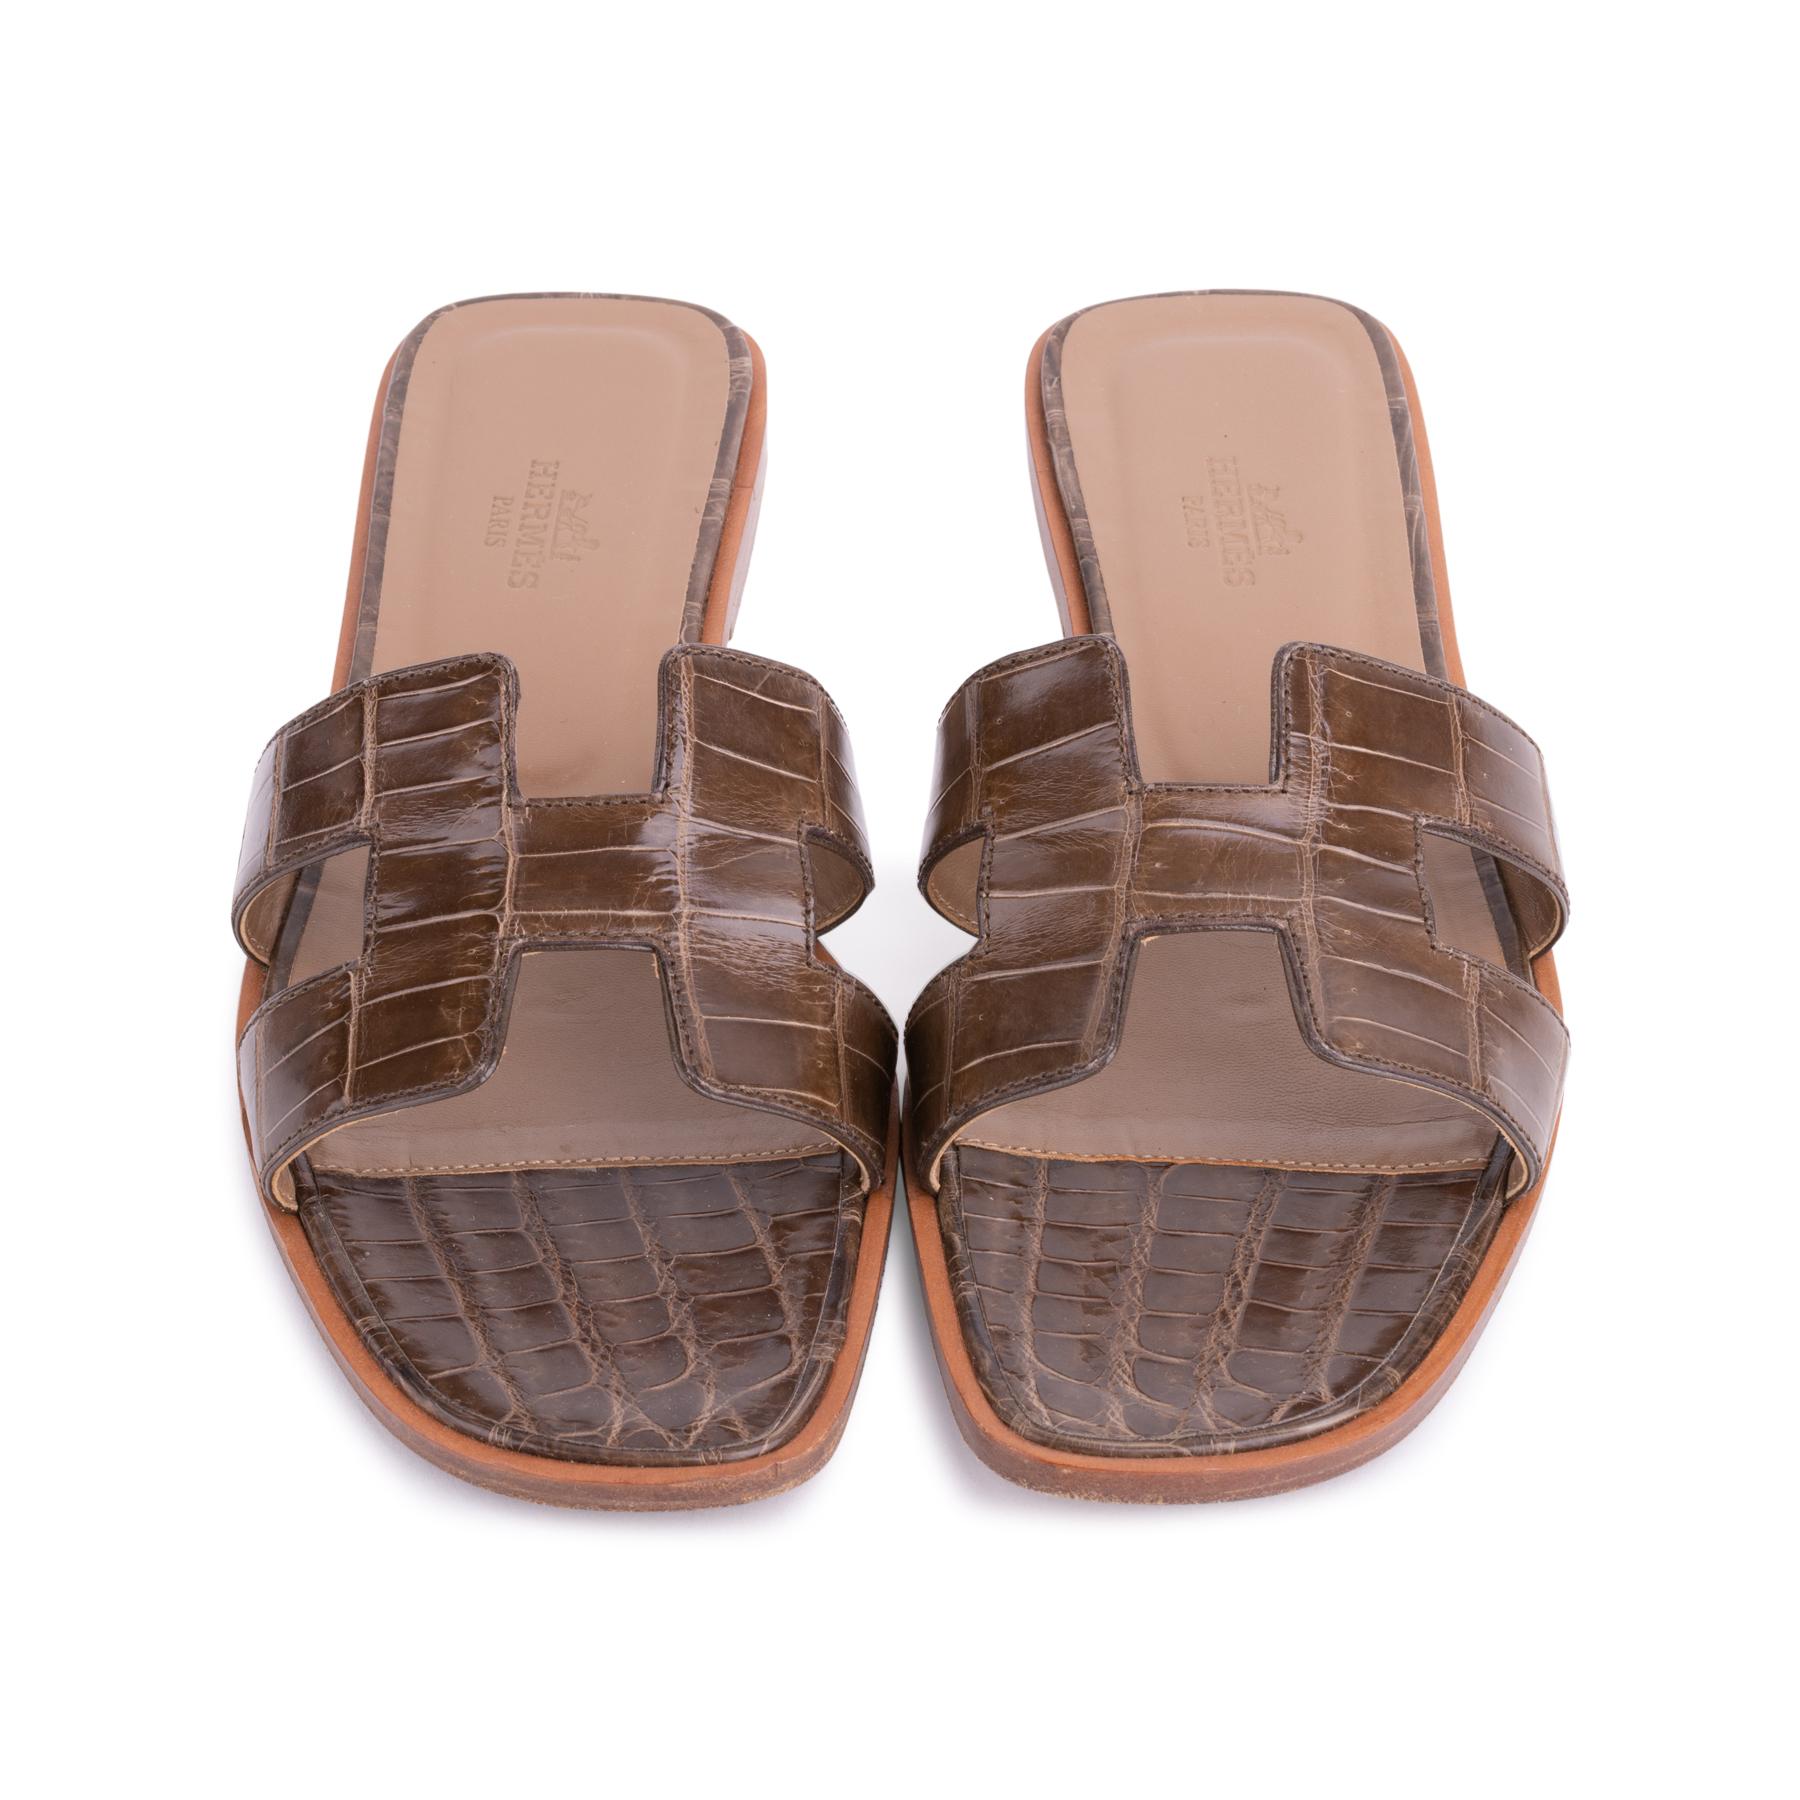 9c2083080deb Authentic Second Hand Hermès Crocodile Oran Sandals (PSS-637-00004 ...